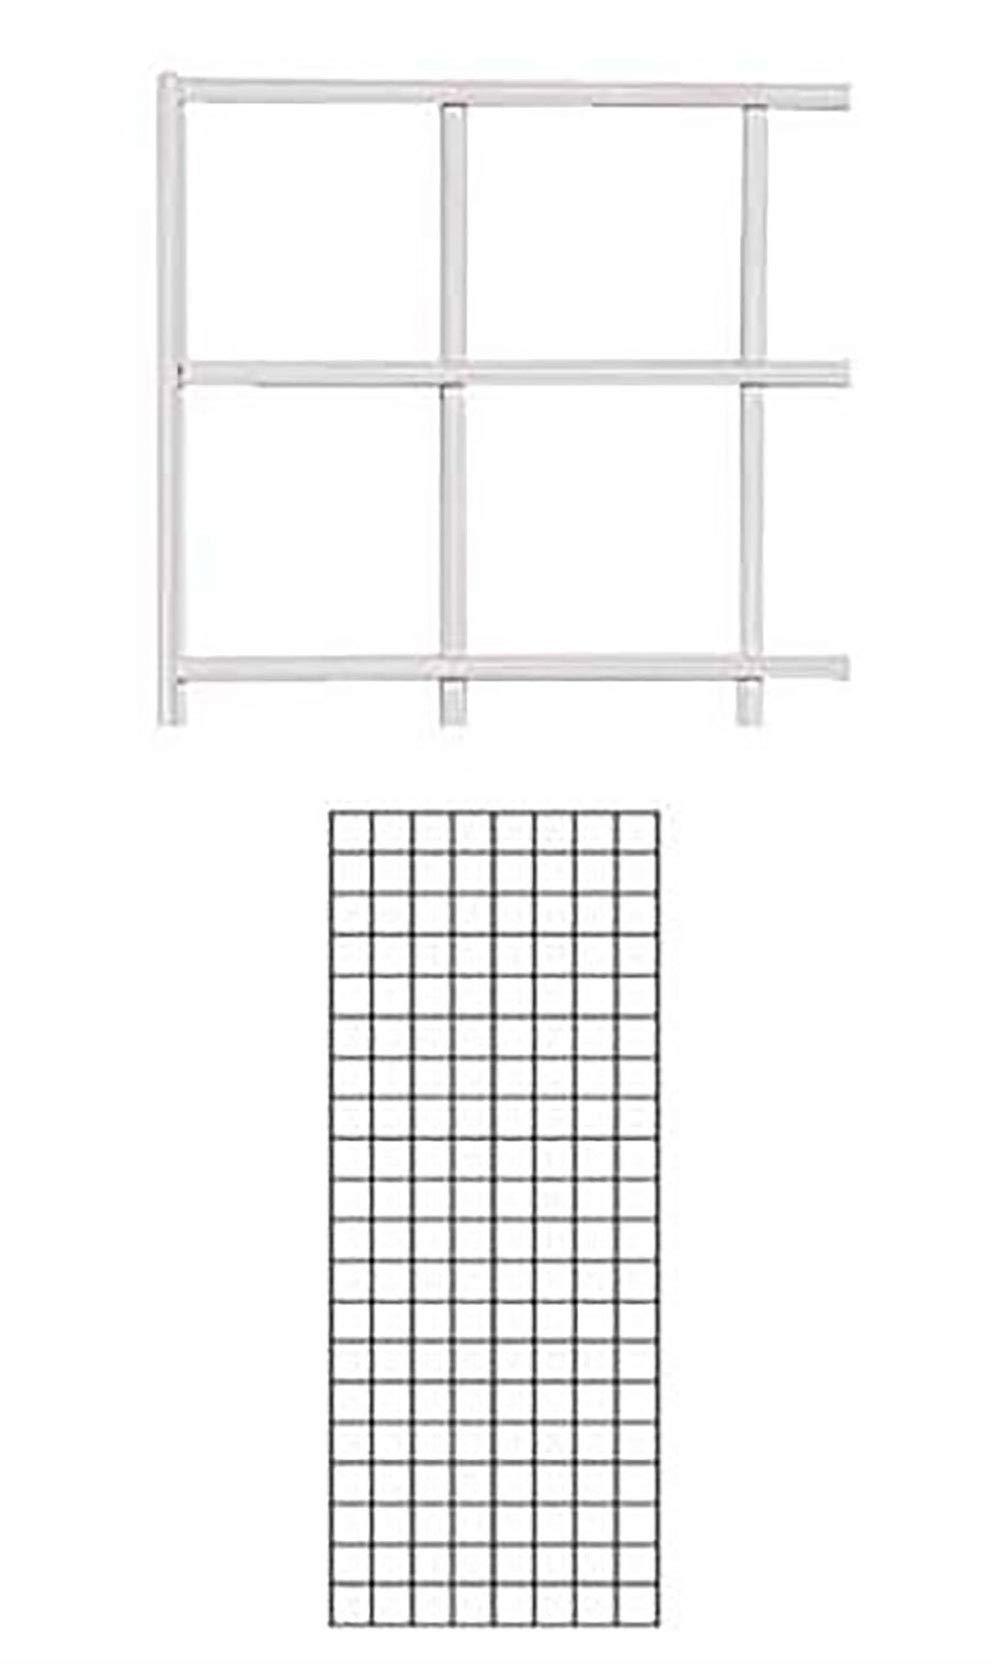 2' X 5' Wire Grid Panel - White